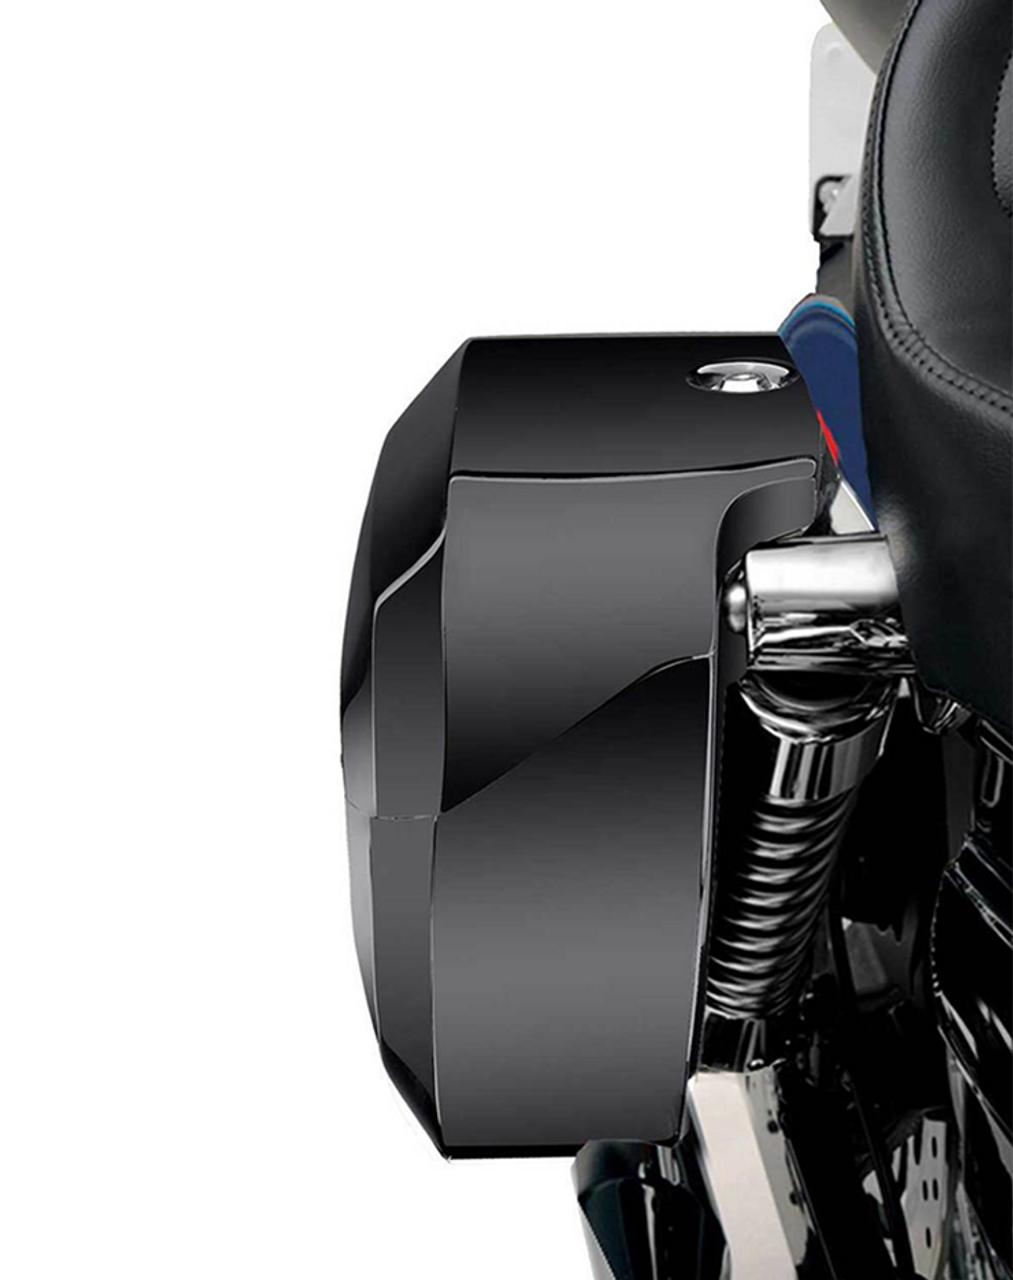 Honda 1500 Valkyrie Standard Lamellar Extra Large Shock Cutout Saddlebag Shock Cutout View